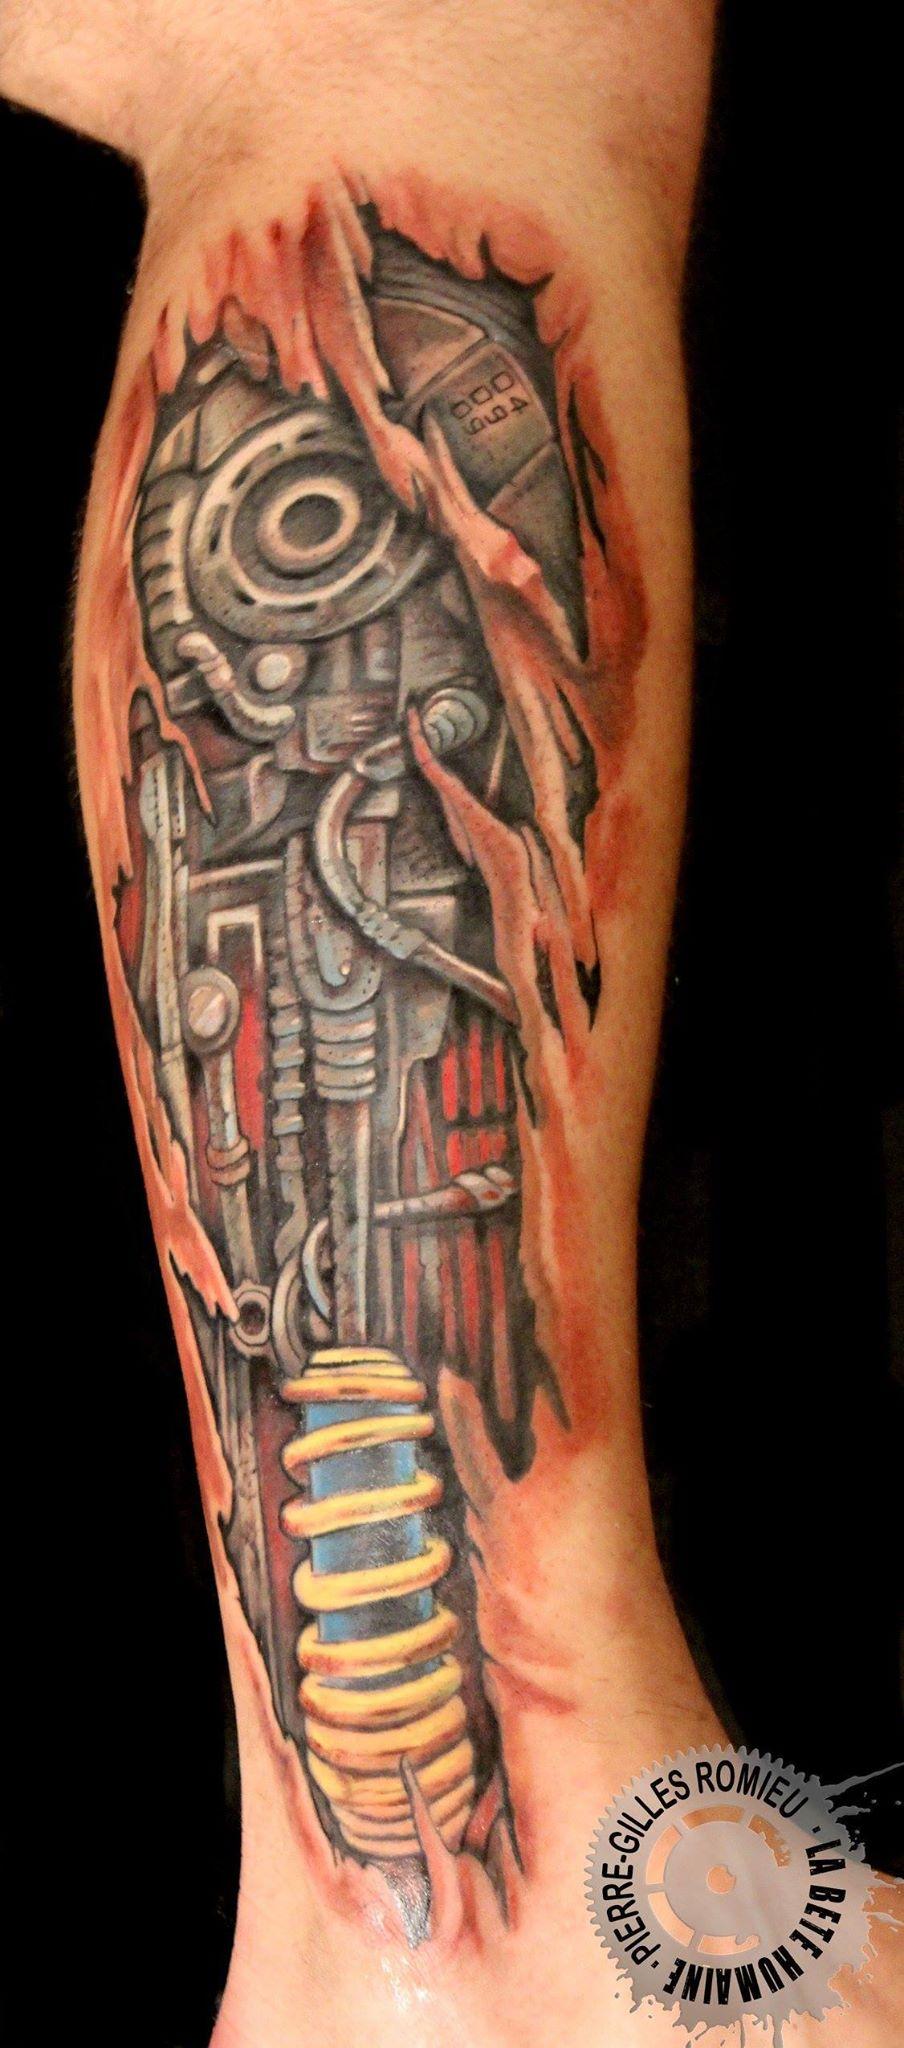 tatouage,biomecanique,piston,jambe